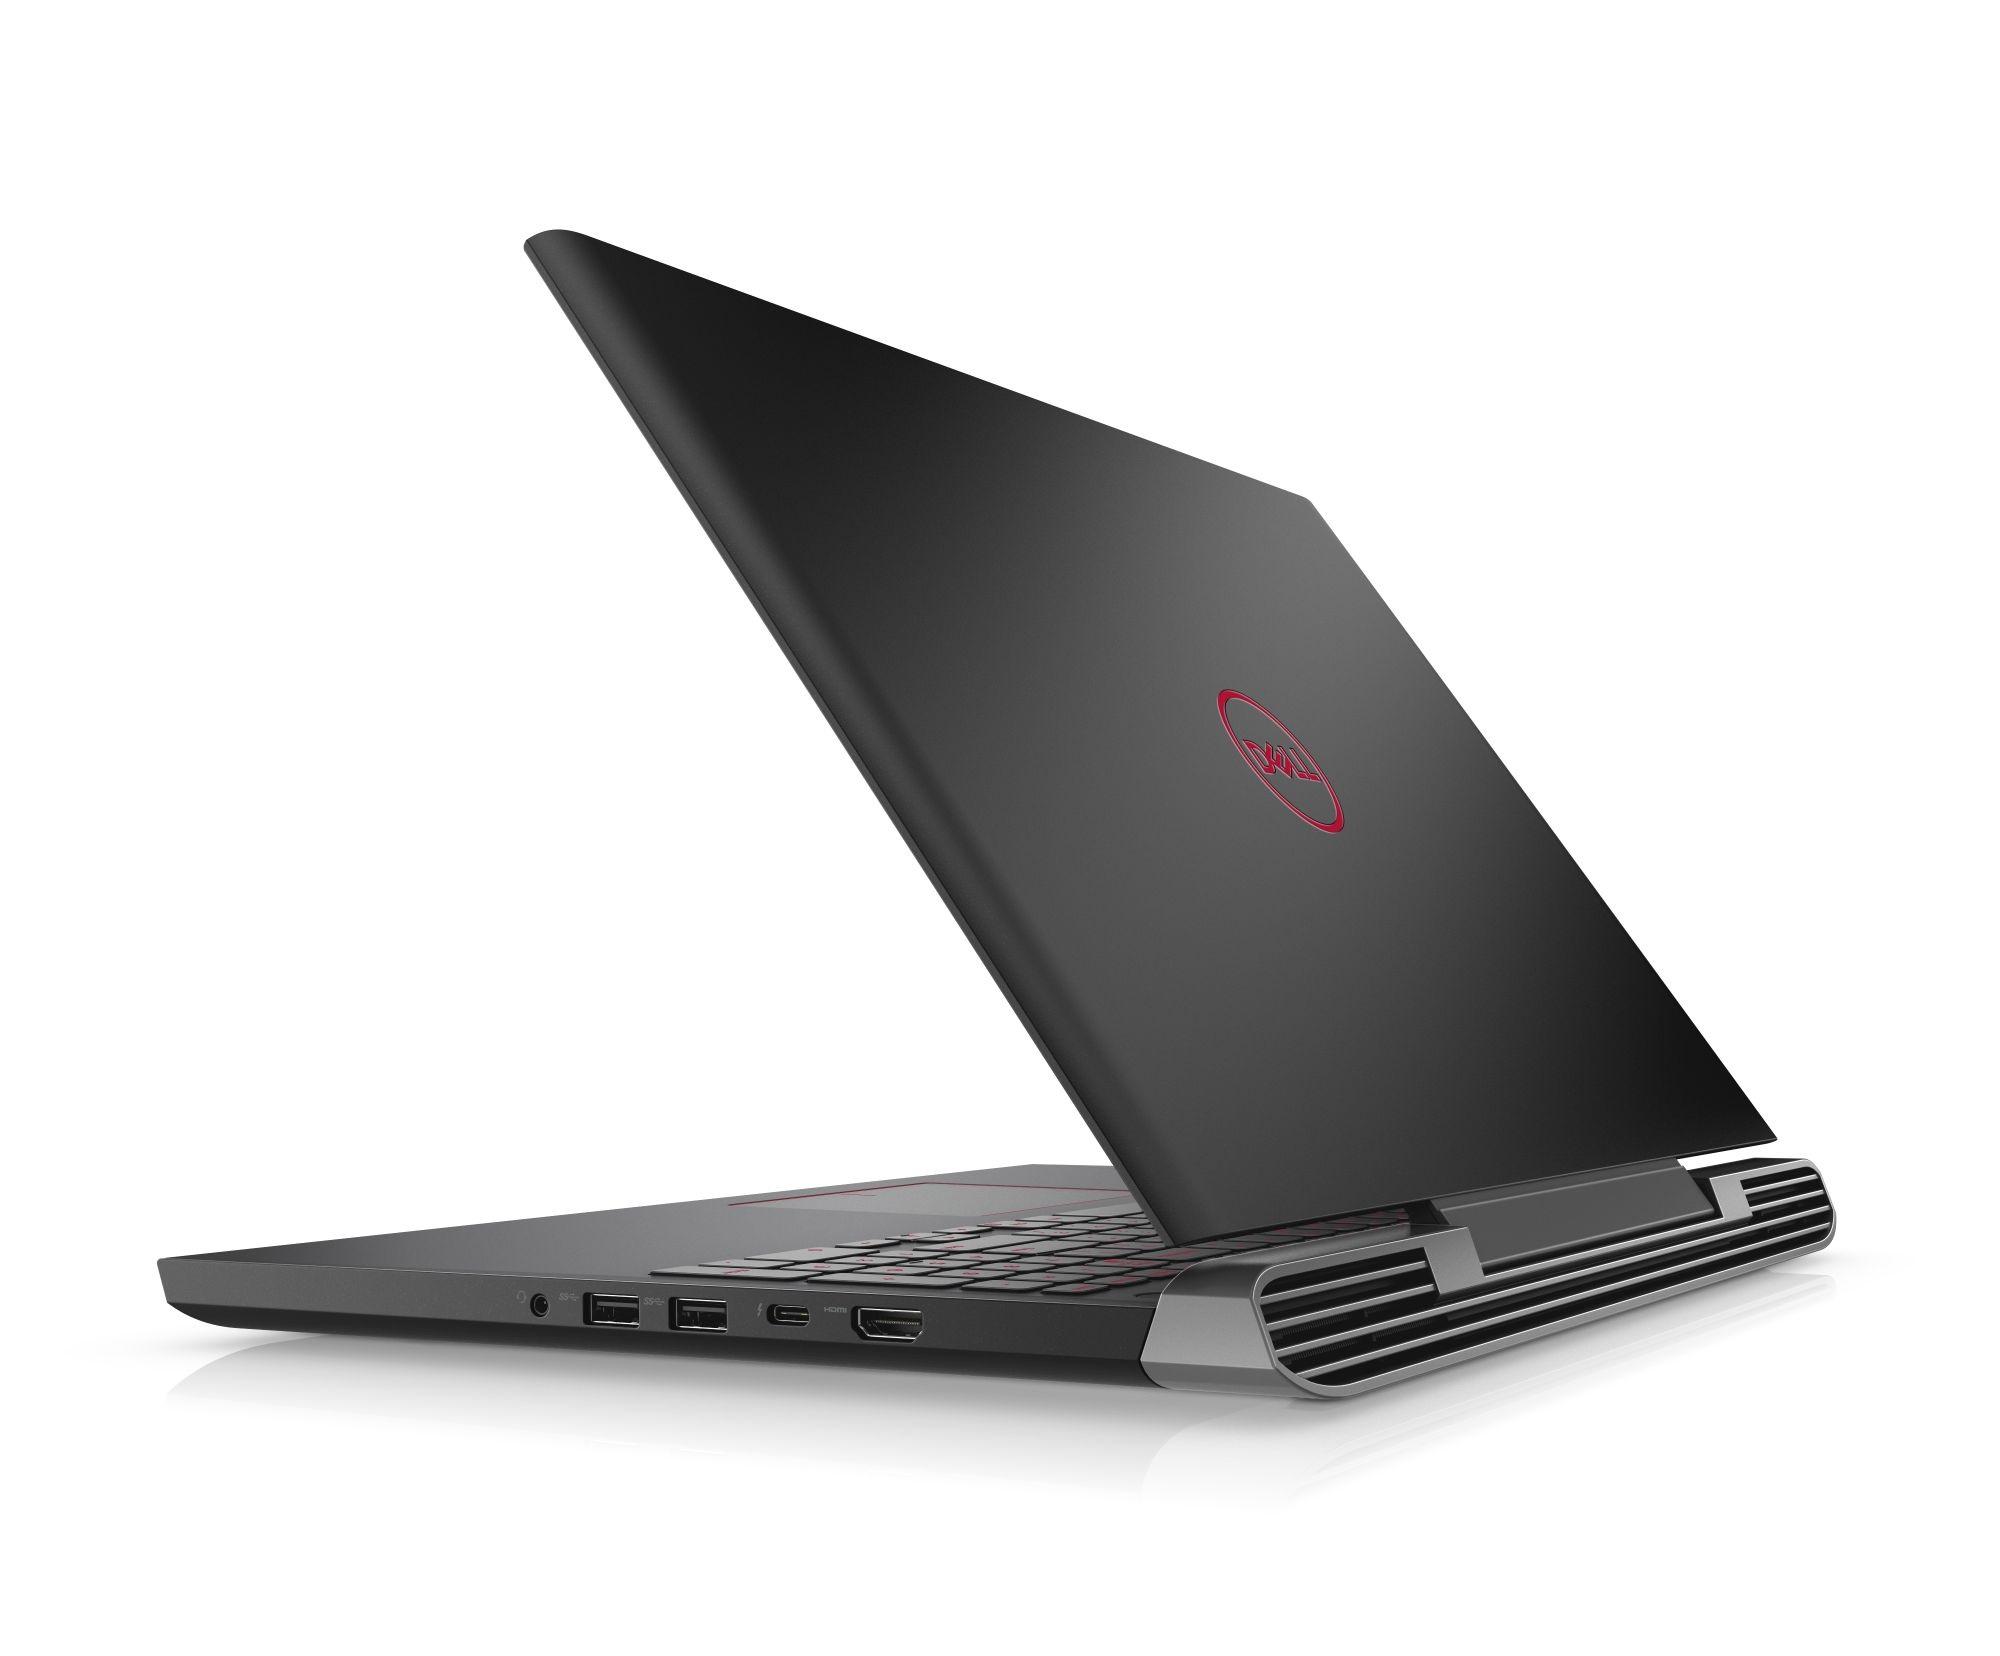 Dell Inspiron G5 5587 15 FHD i9-8950HK/16GB/256GB SSD+1TB/1060-6G/MCR/FPR/HDMI/THB/W10/2RNBD/Černý